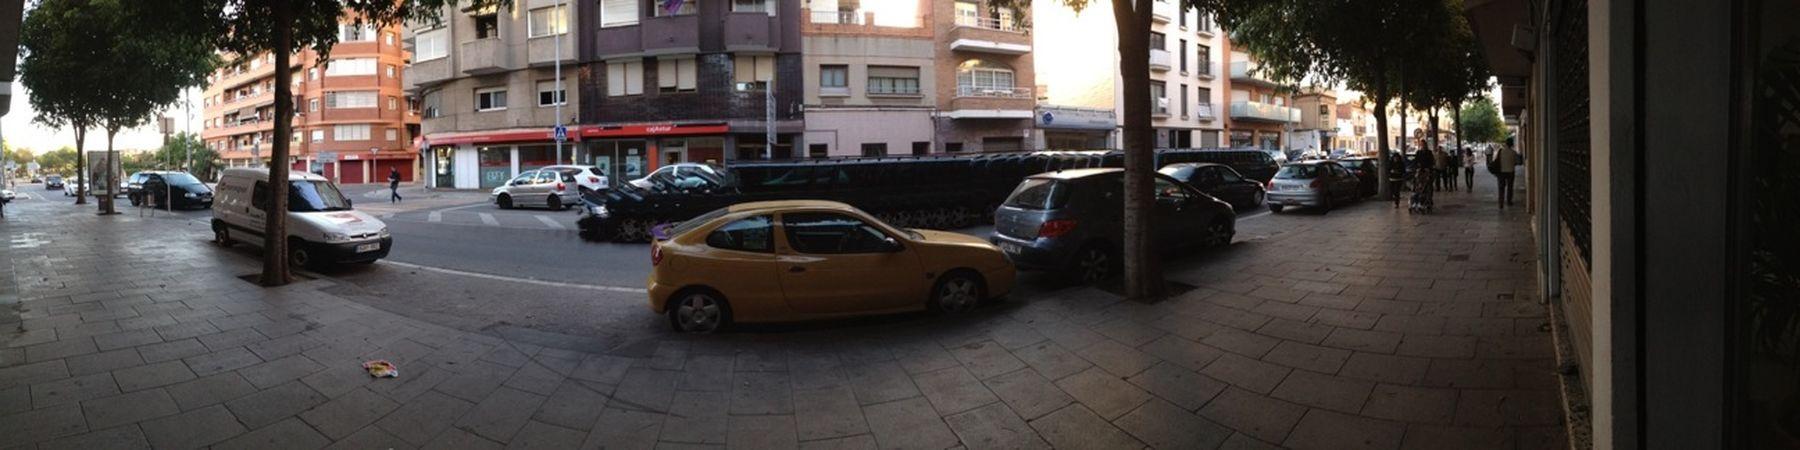 Simply Street